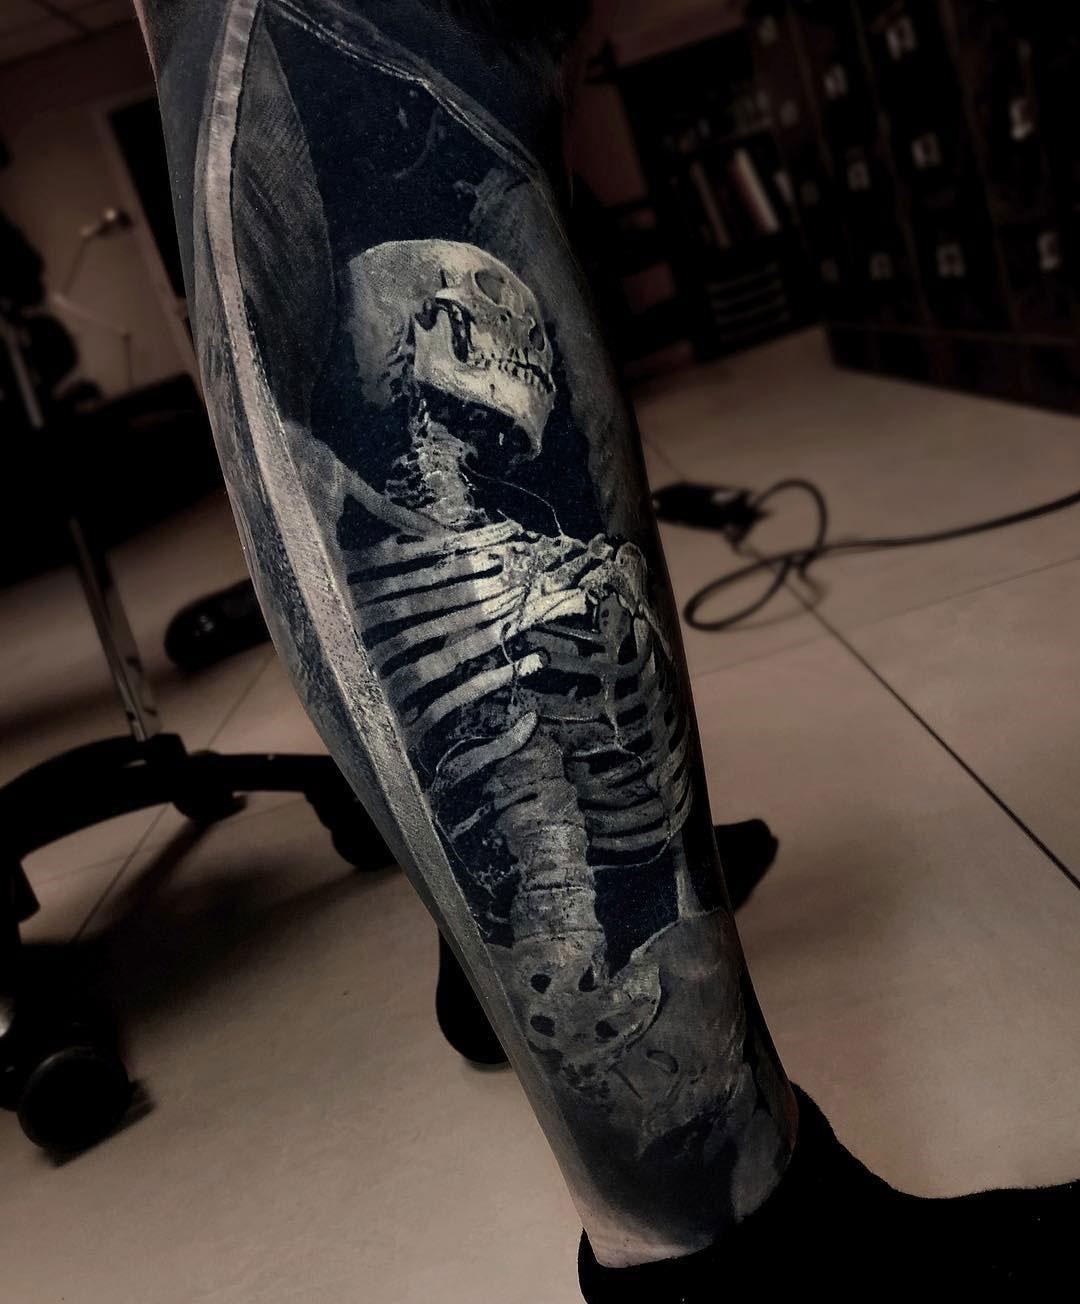 3d Skeleton On Guys Calf Best Tattoo Design Ideas